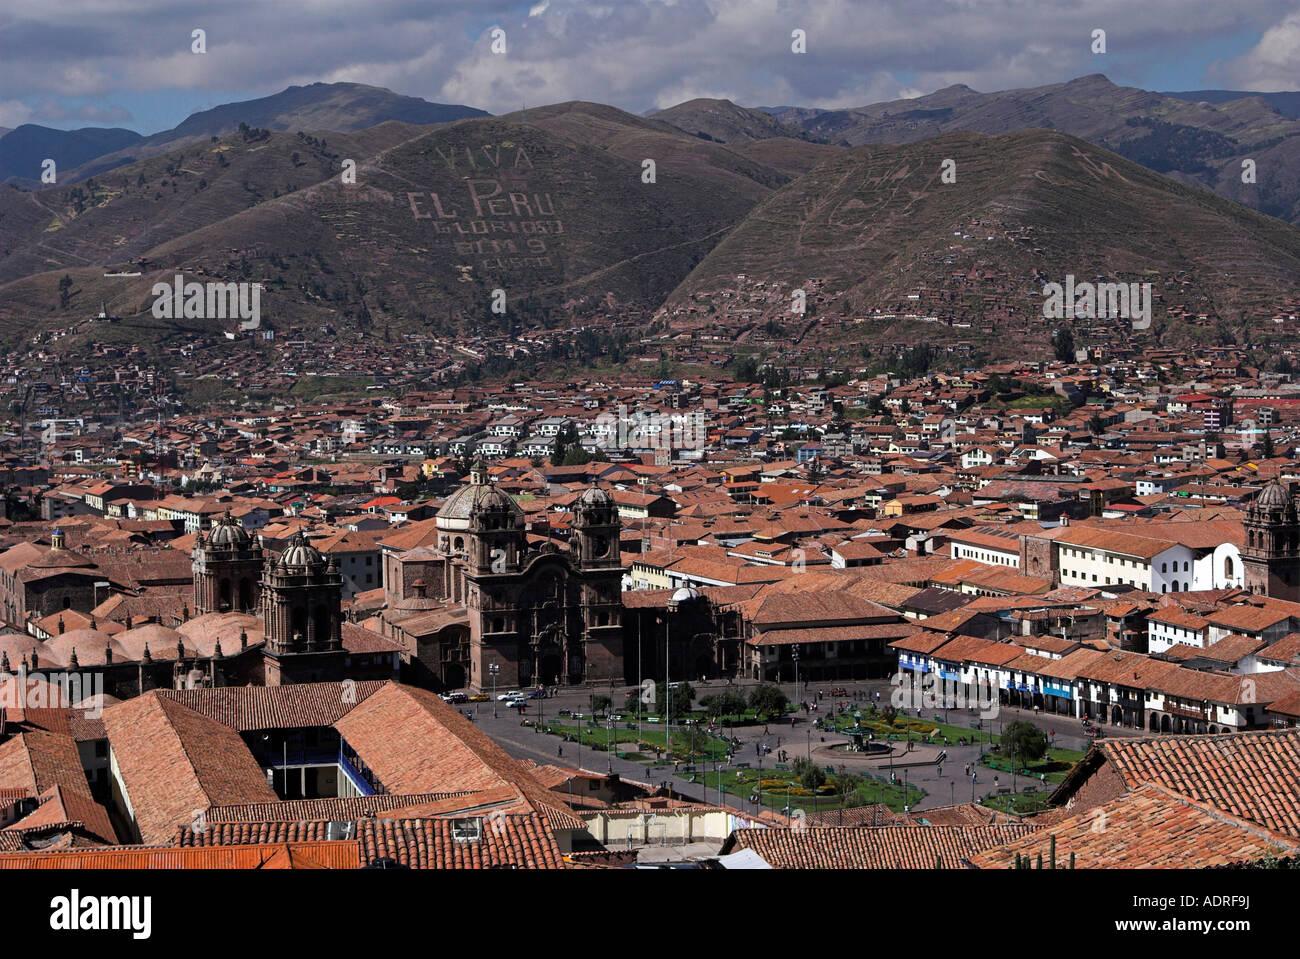 Uncommon Treasures - Cuzco - Capital of the Inca